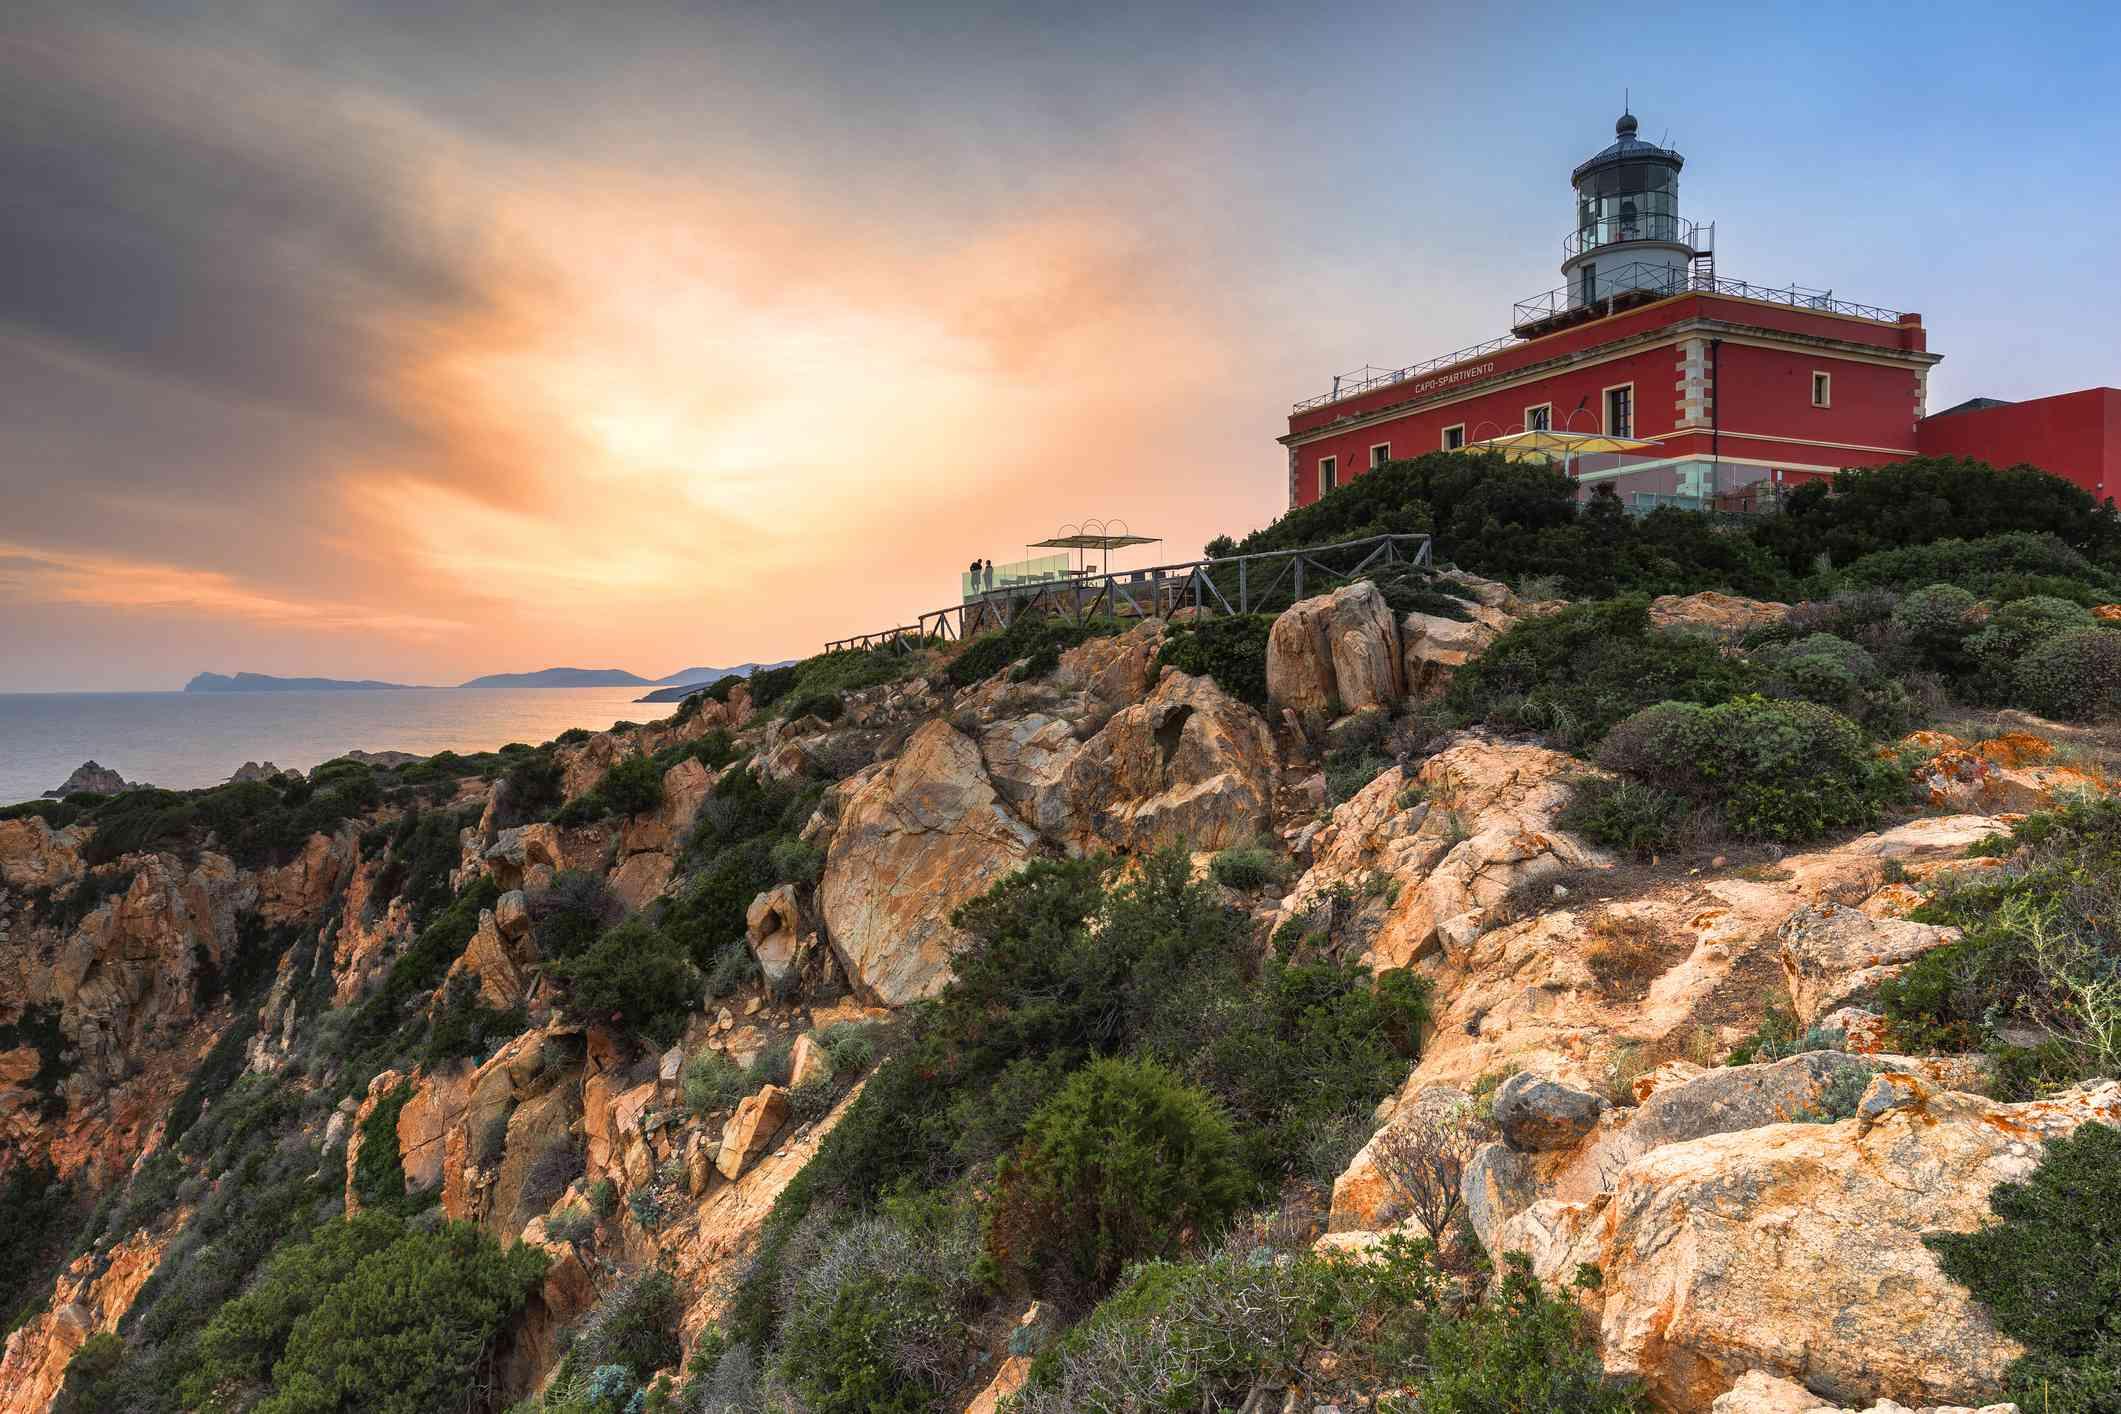 Sunset from the lighthouse of Capo Spartivento, Domus de Maria, Cagliari province, Sardinia